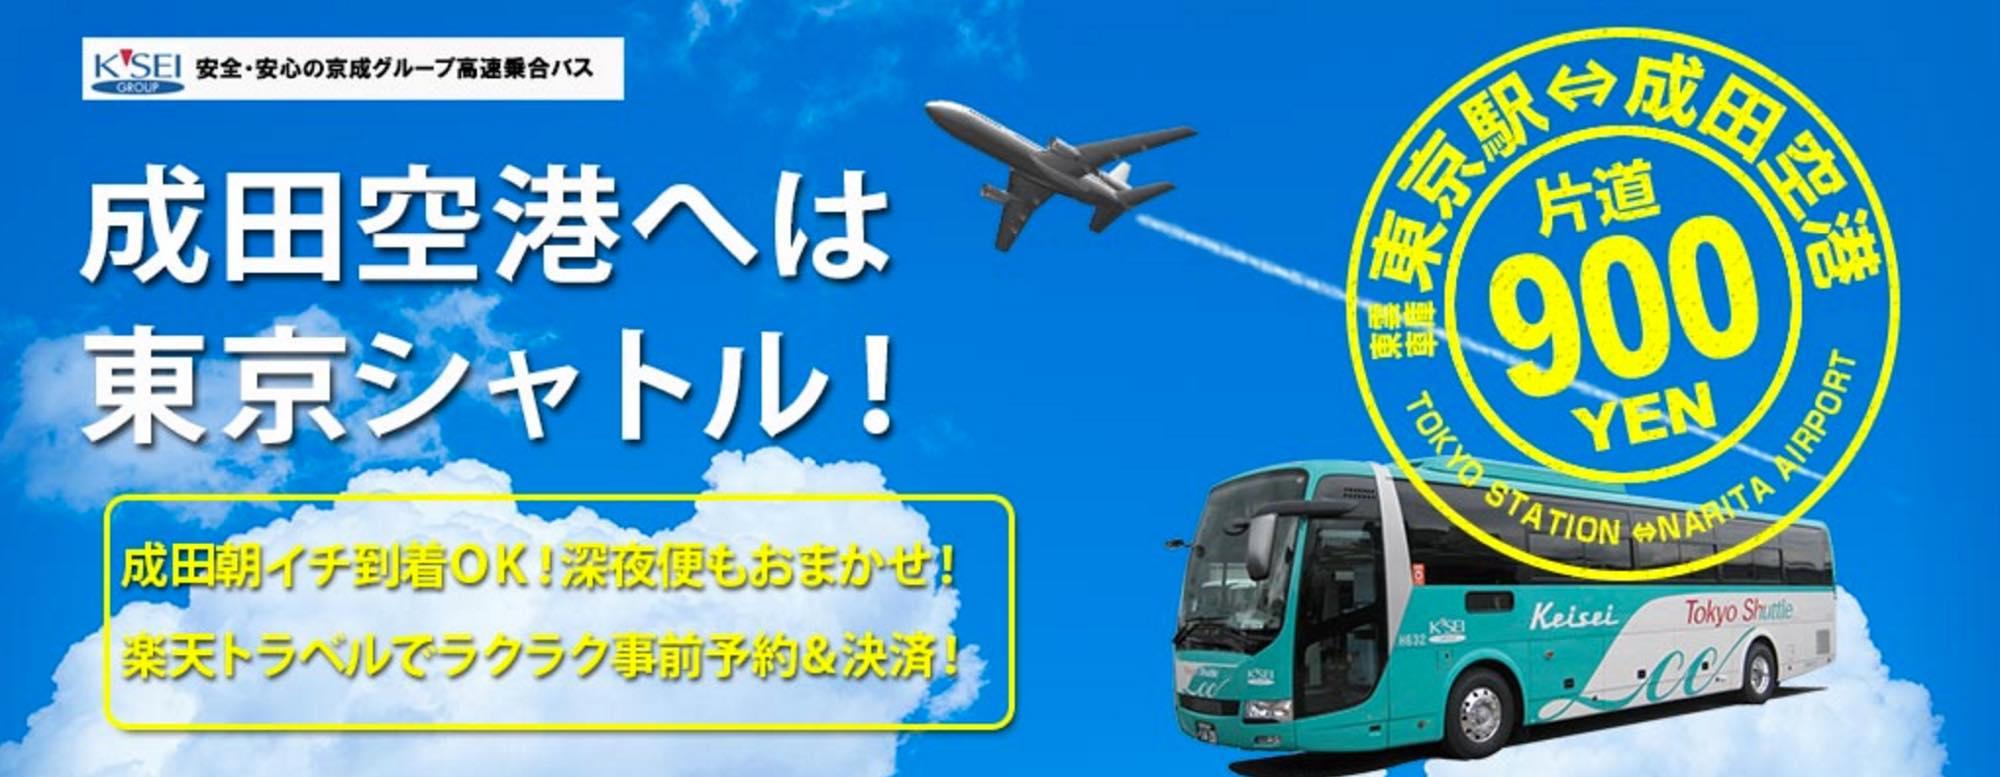 keisei-bus-narita9